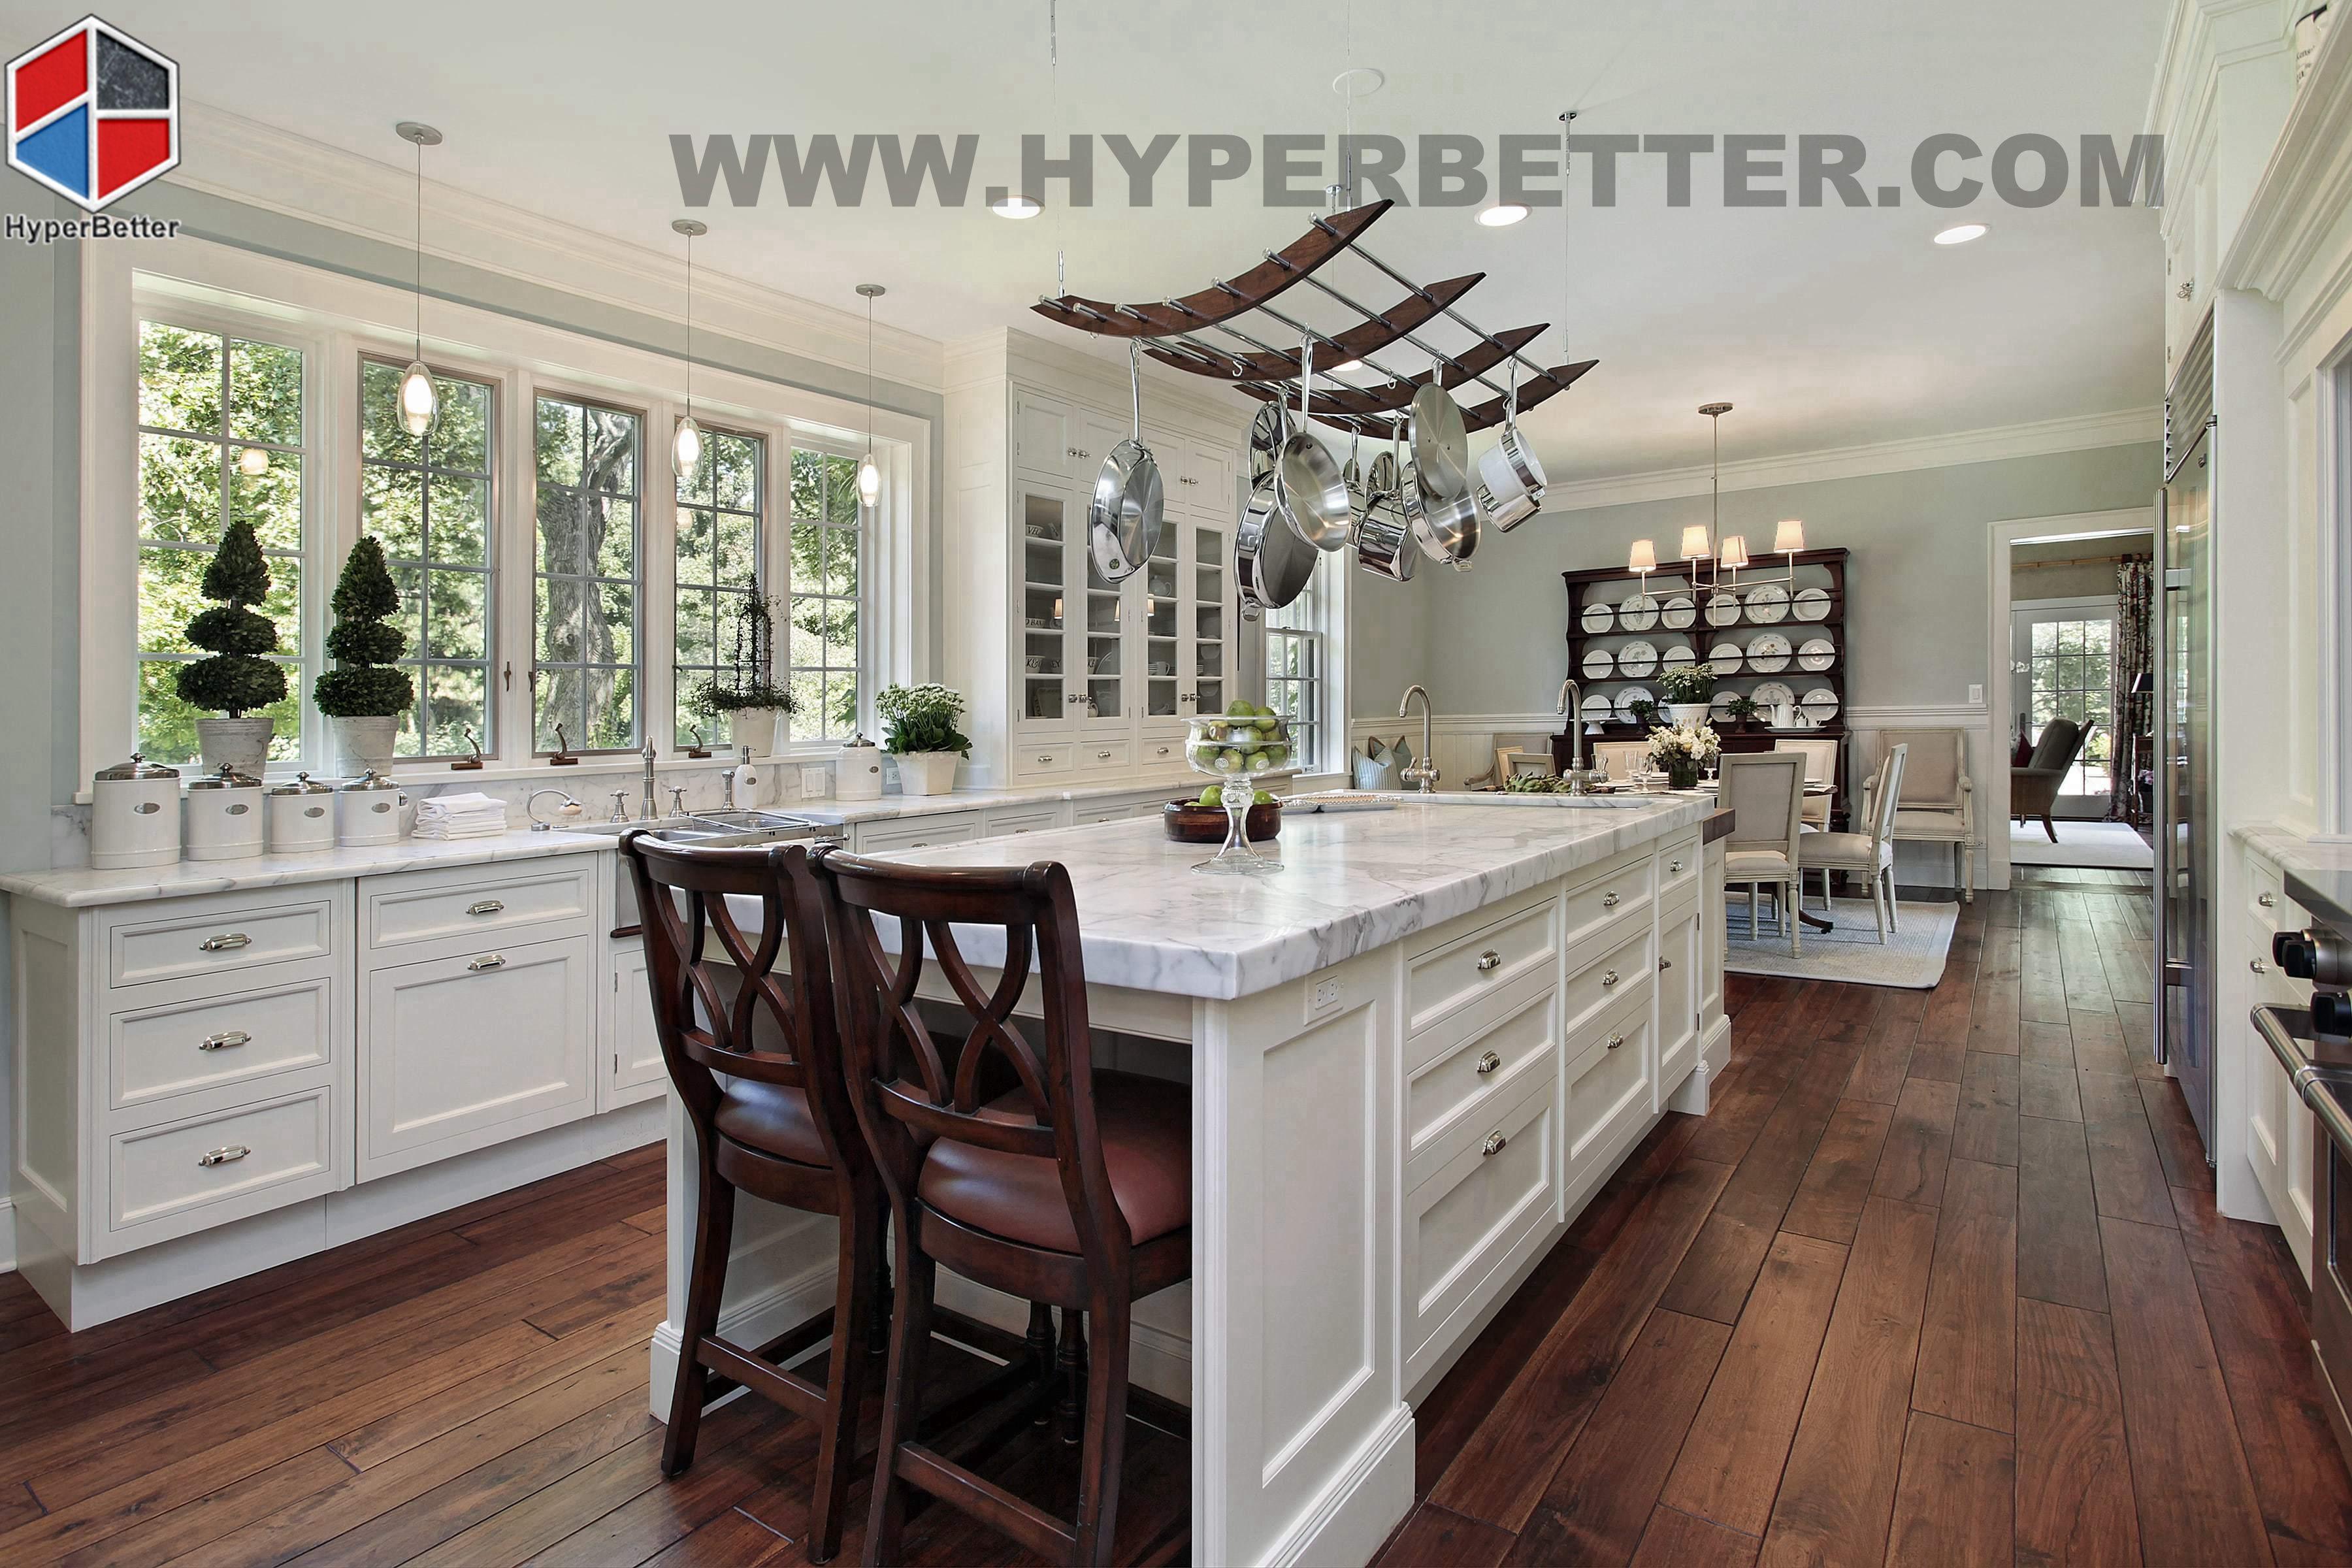 Kitchen red granite countertops display